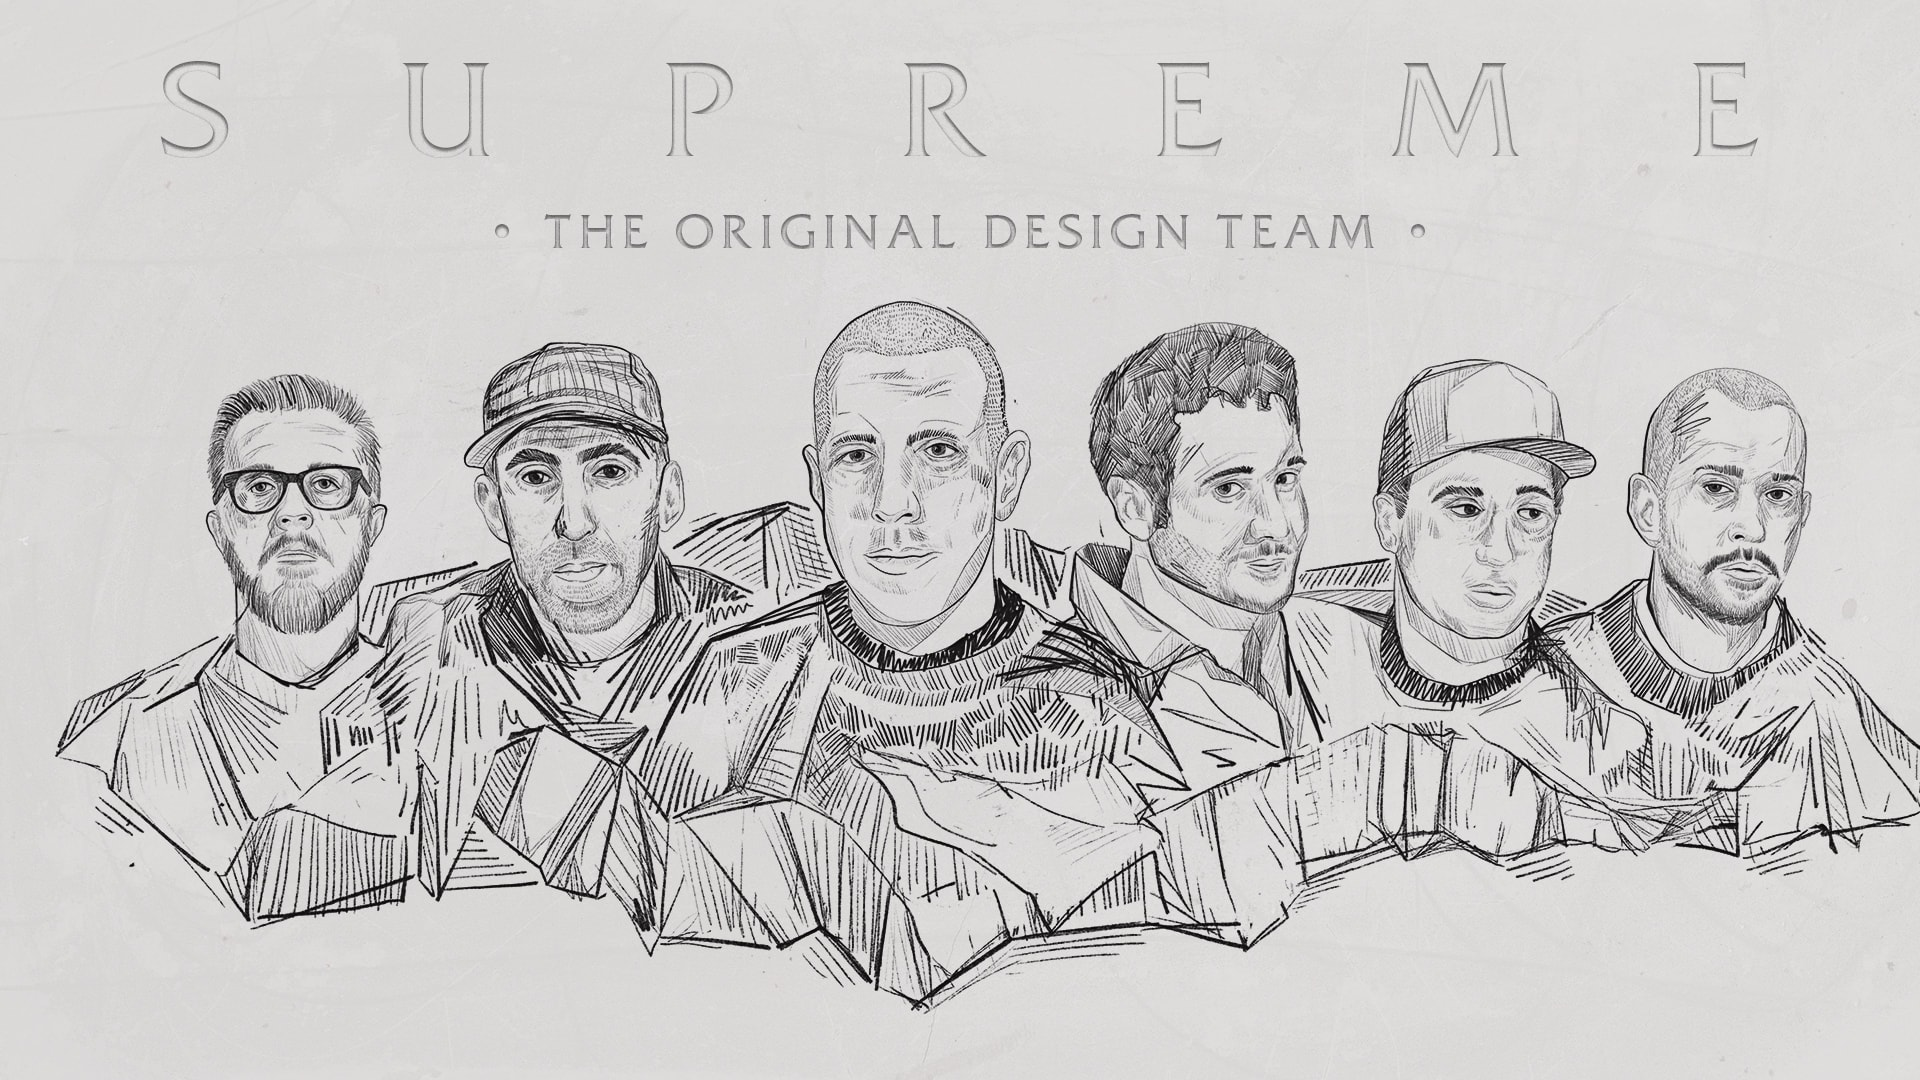 Supreme: The Original Design Team